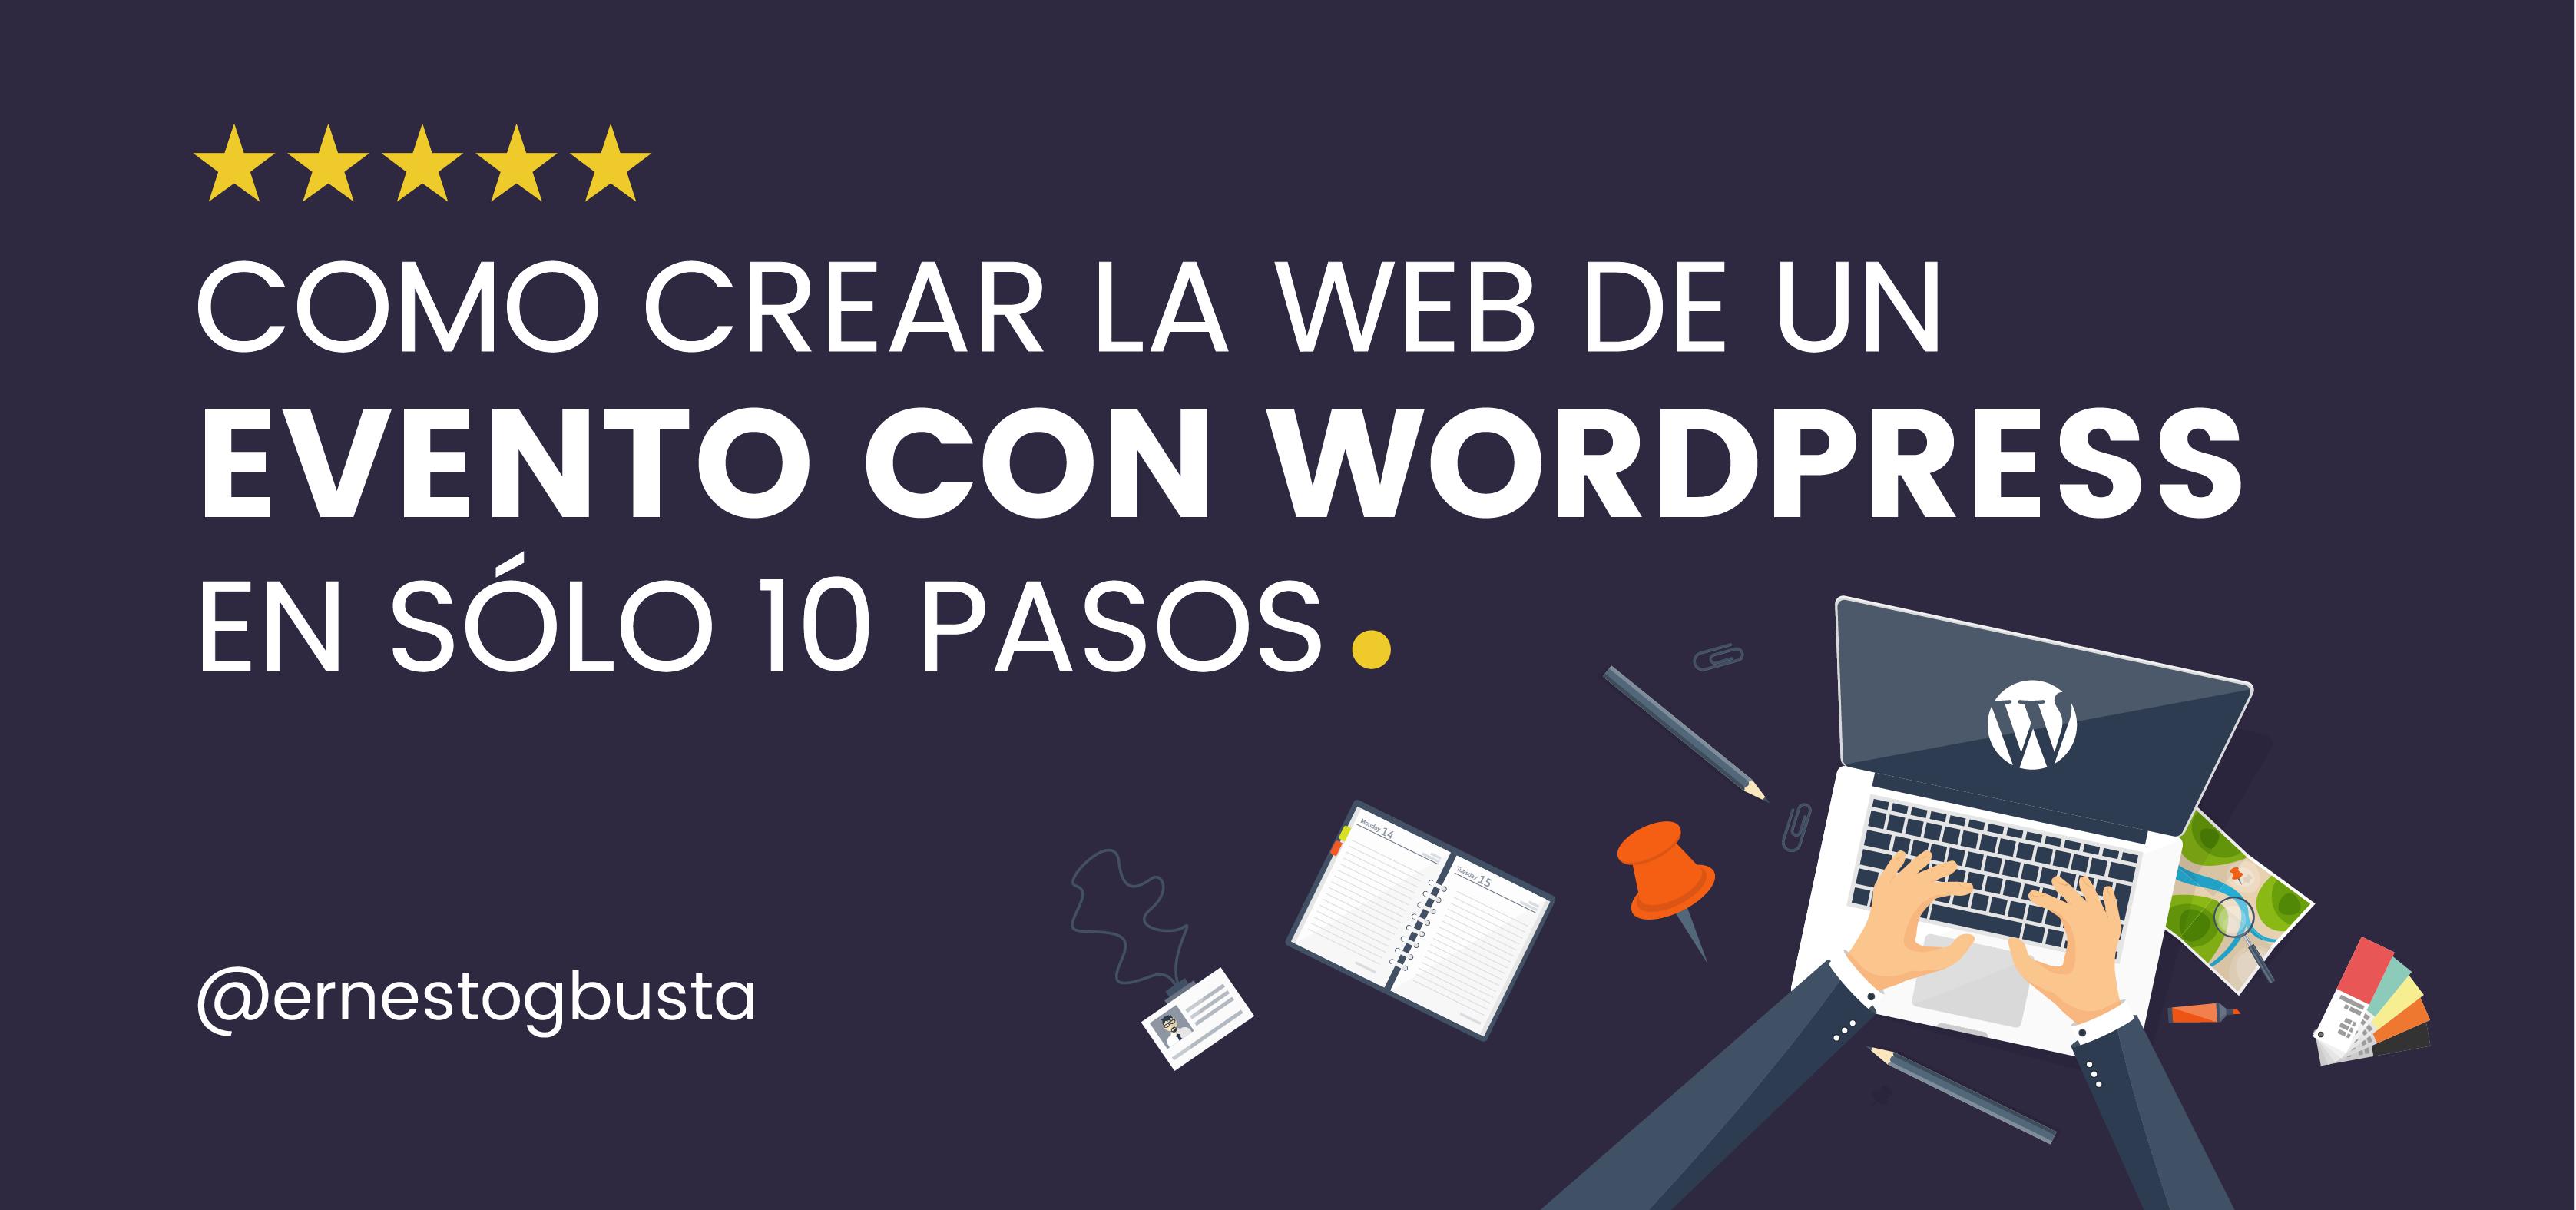 crear web evento wordpress